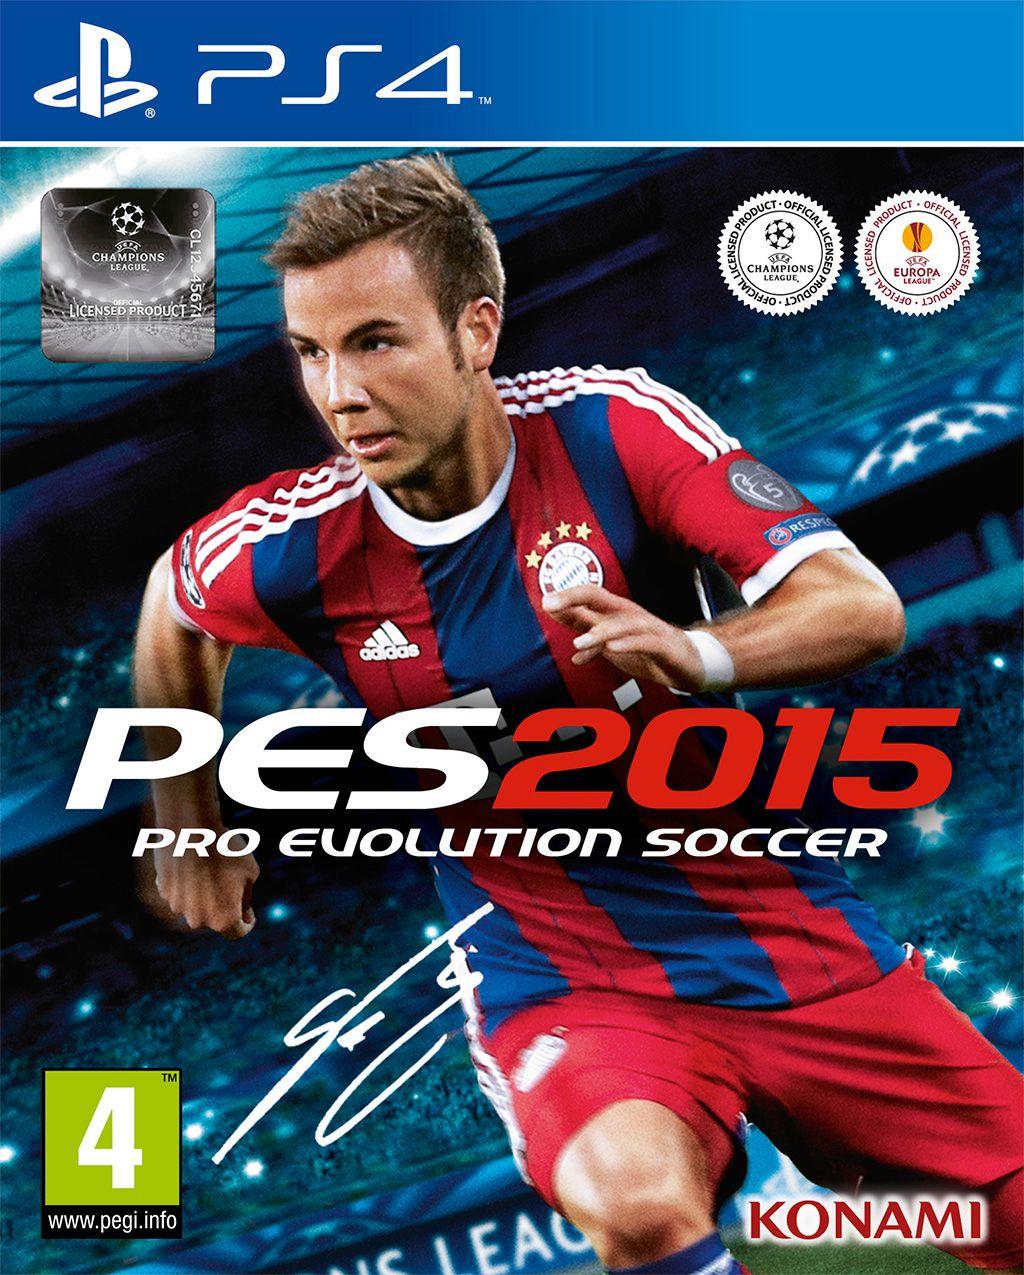 Pro Evolution Soccer 2015 PS4 box art 1024